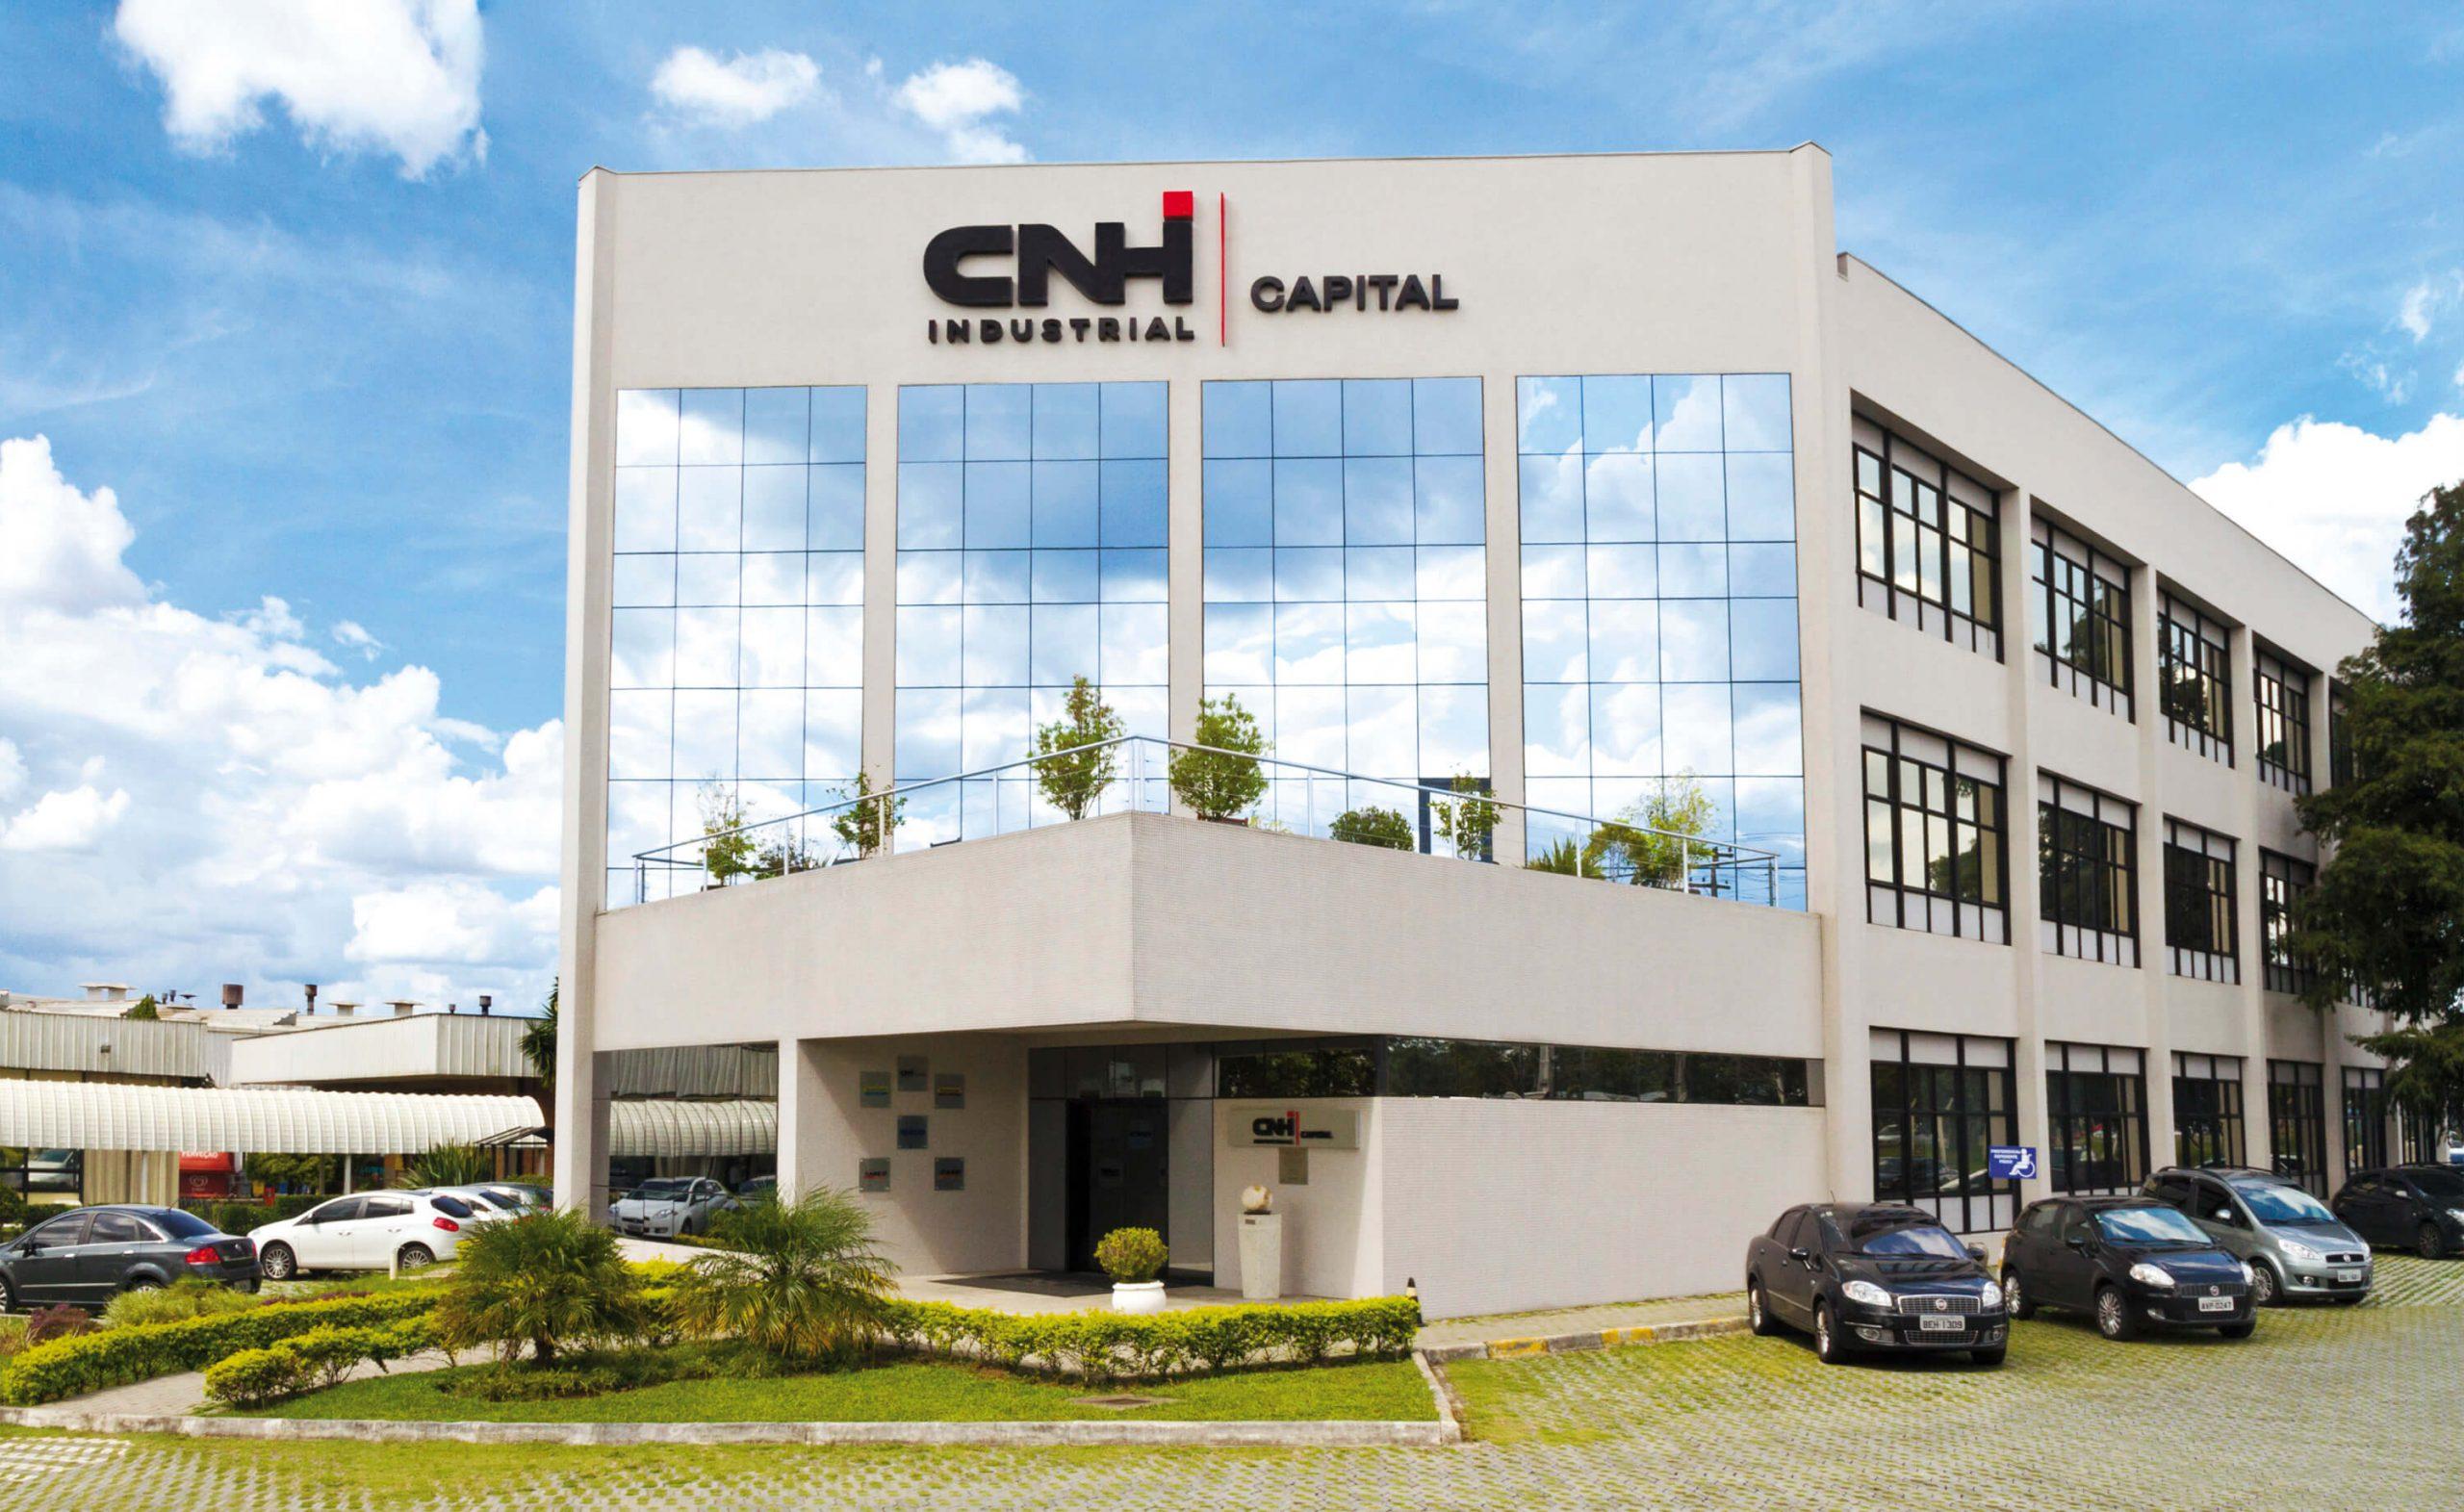 Banco CNH Industrial